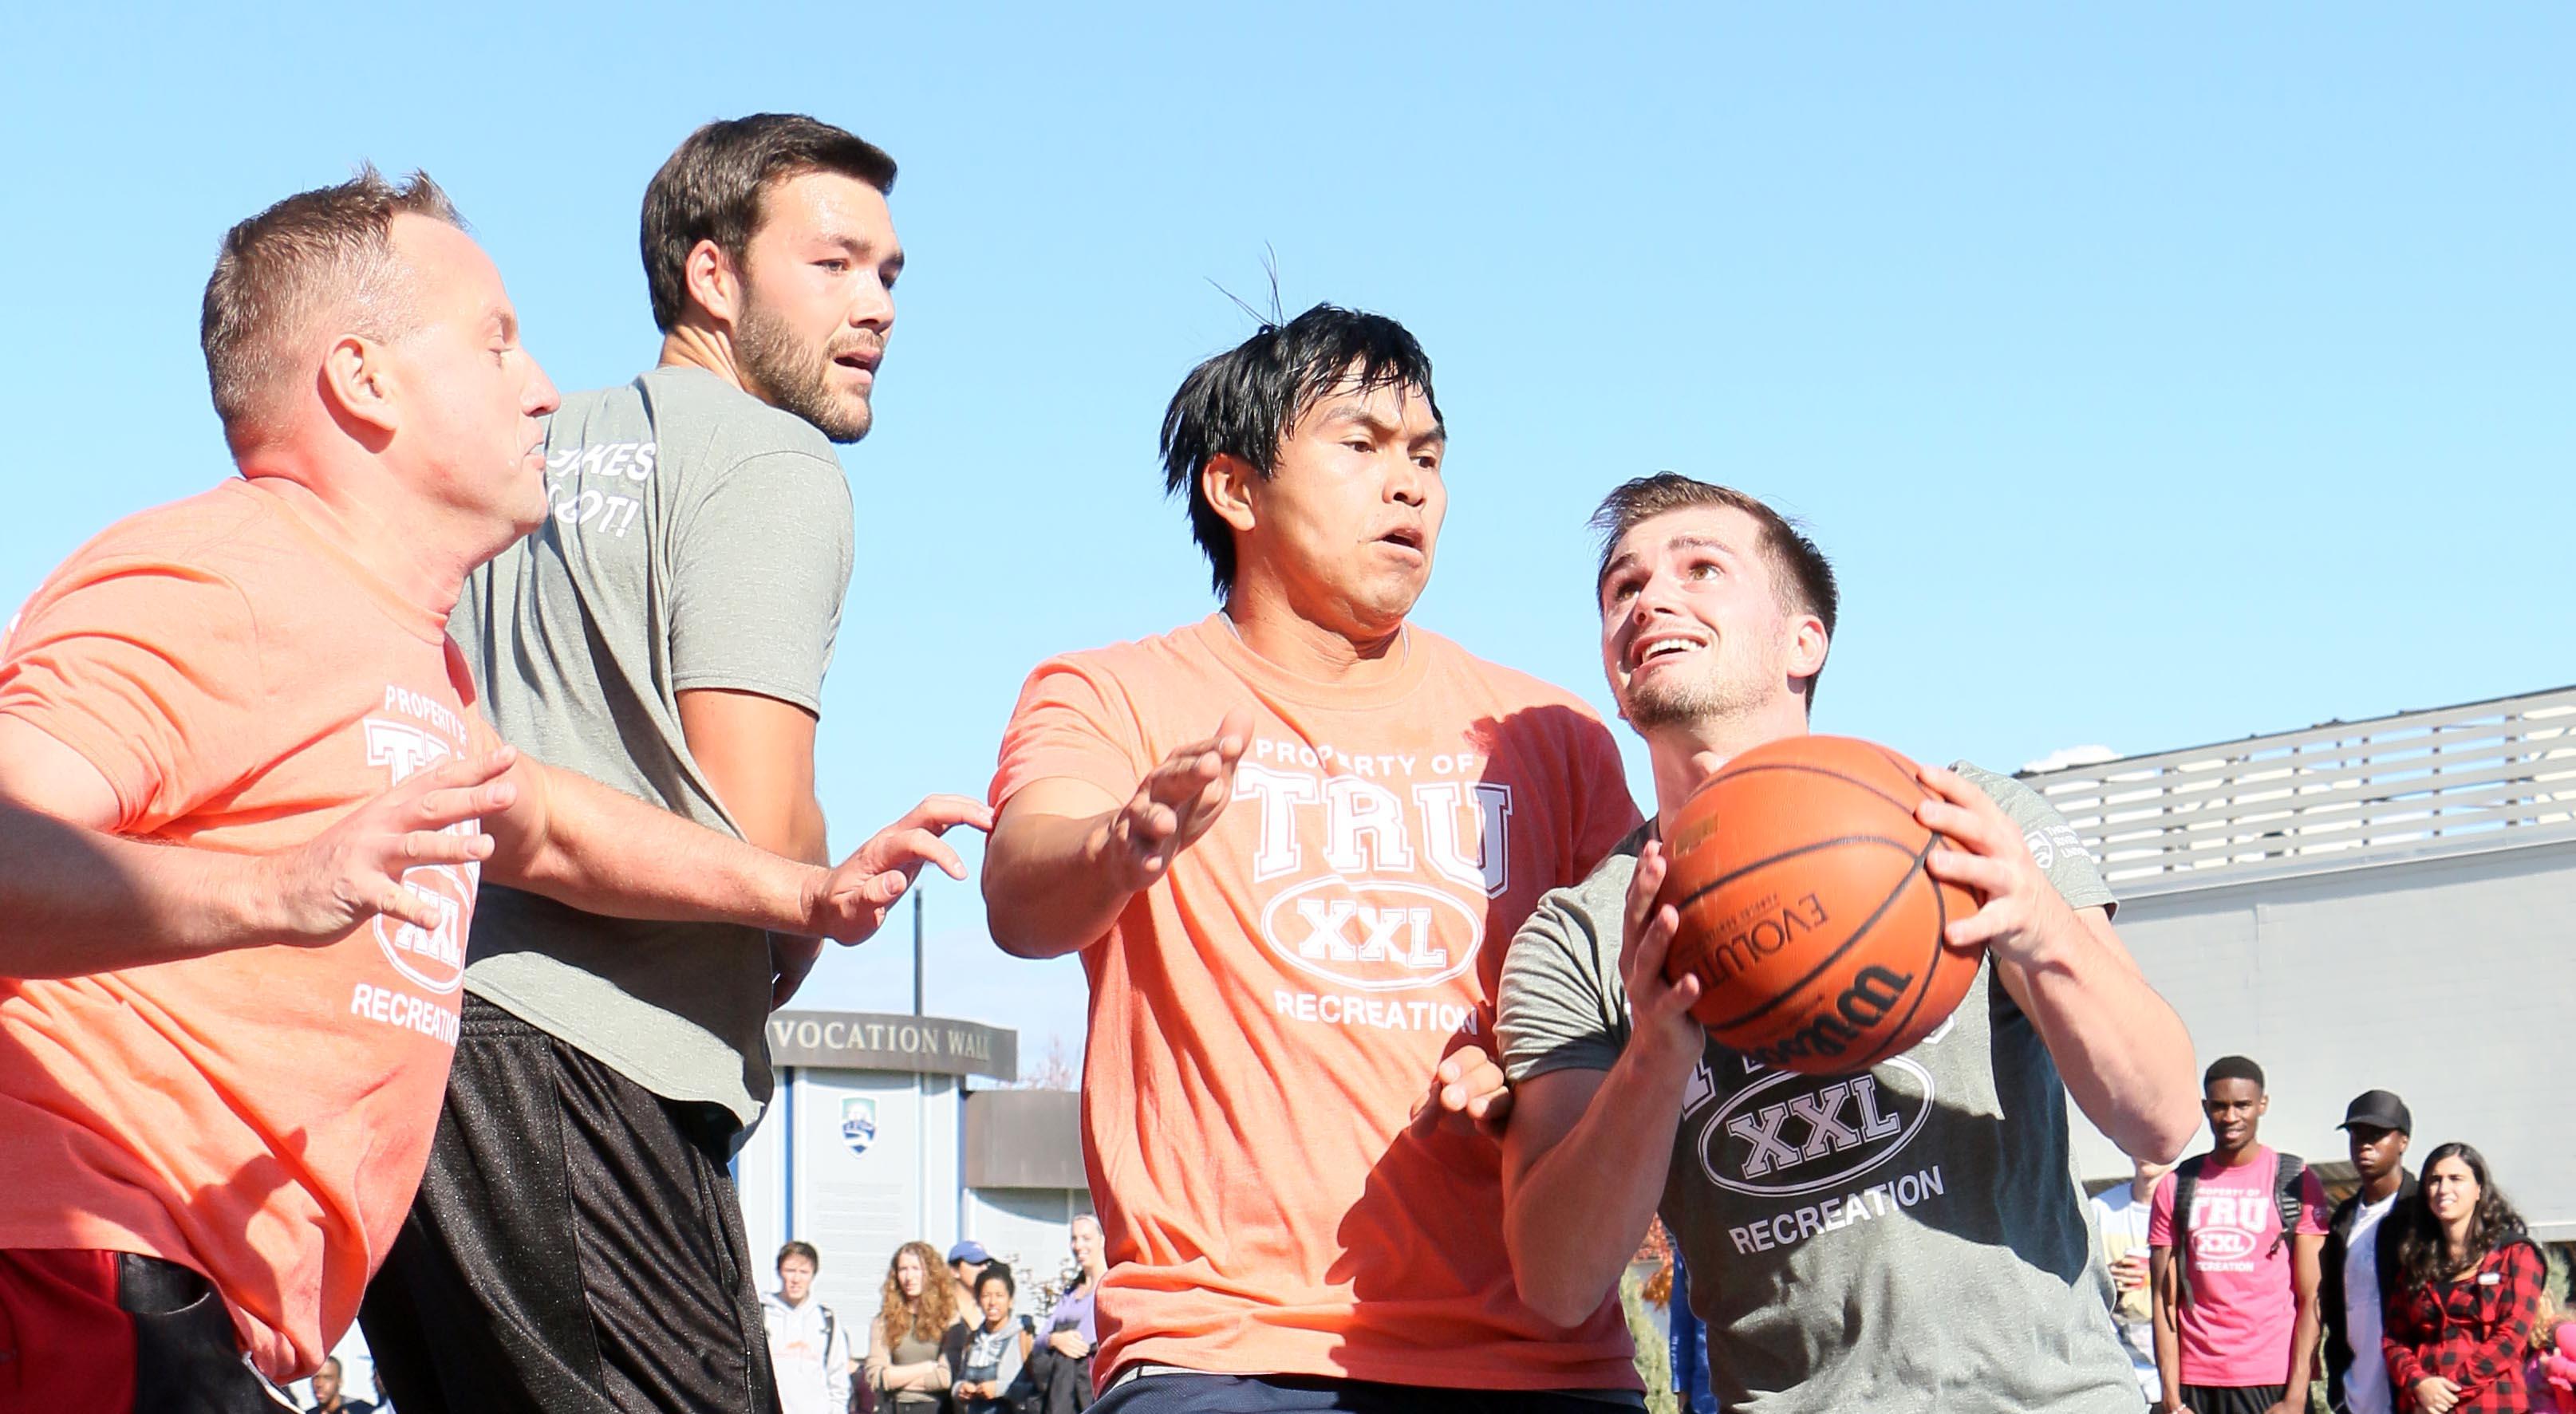 3 on 3 outdoor basketball tournament